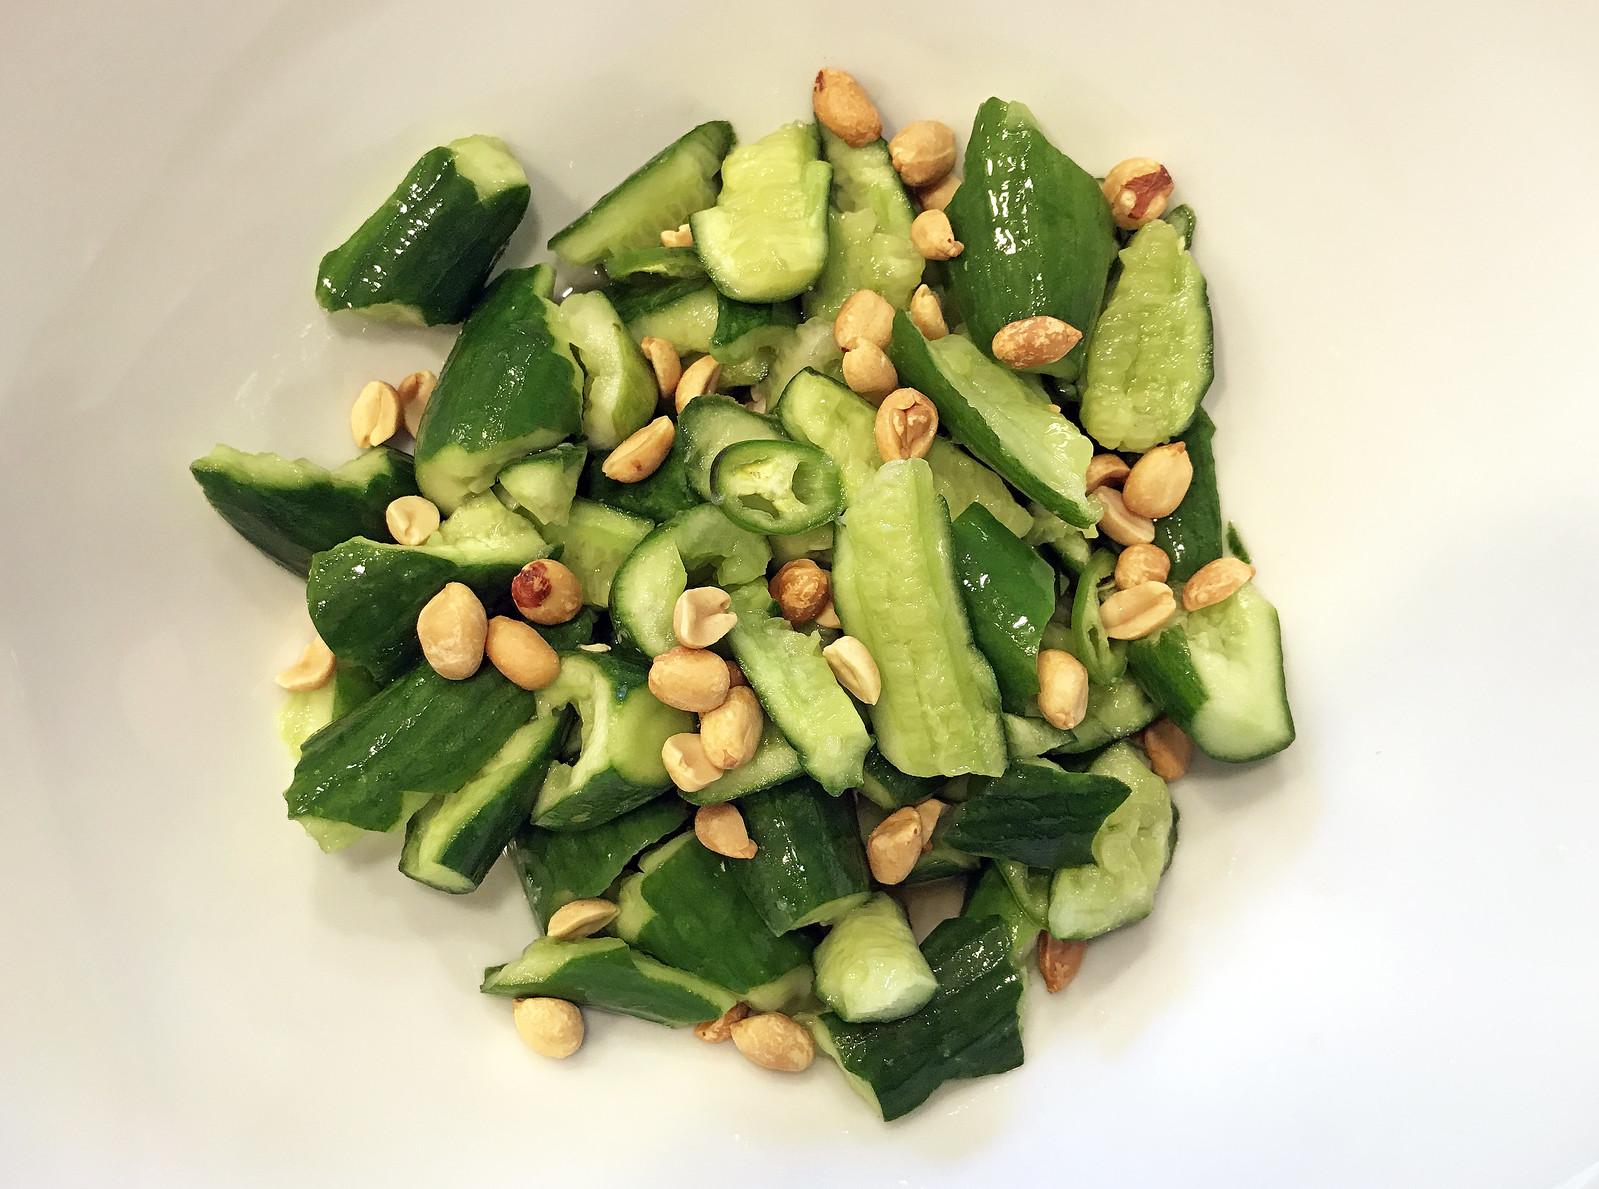 Smashed cucumber salad with hot vinegar